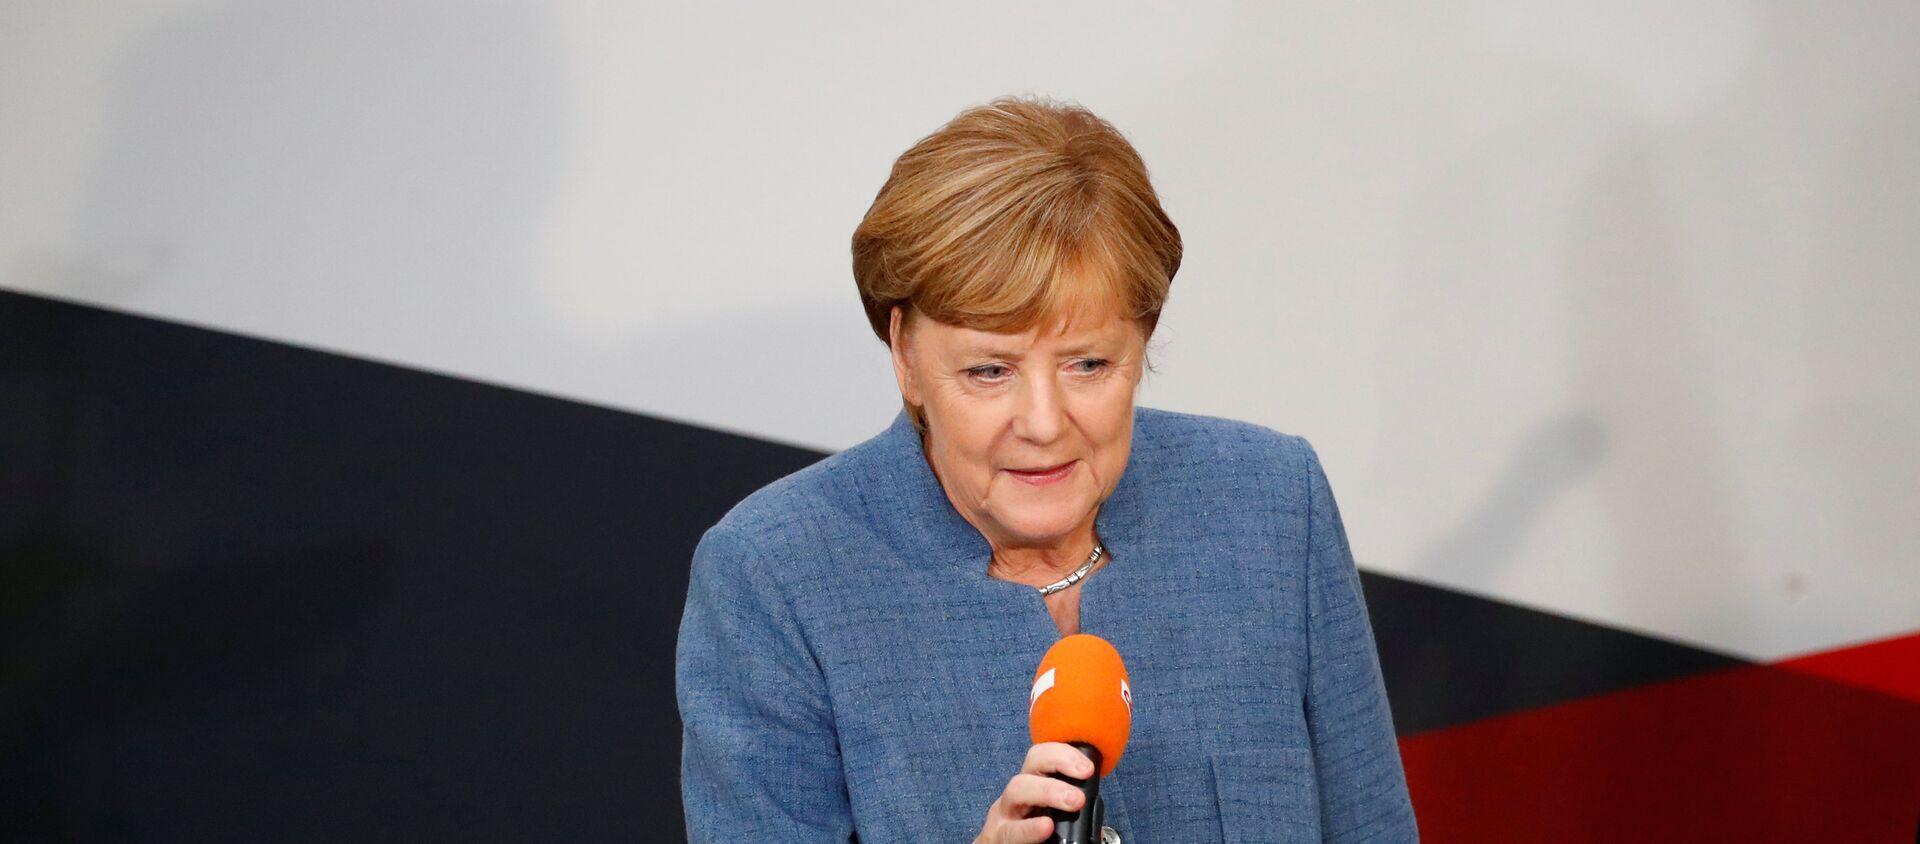 Канцлер Германии Ангела Меркель - Sputnik Грузия, 1920, 25.09.2017